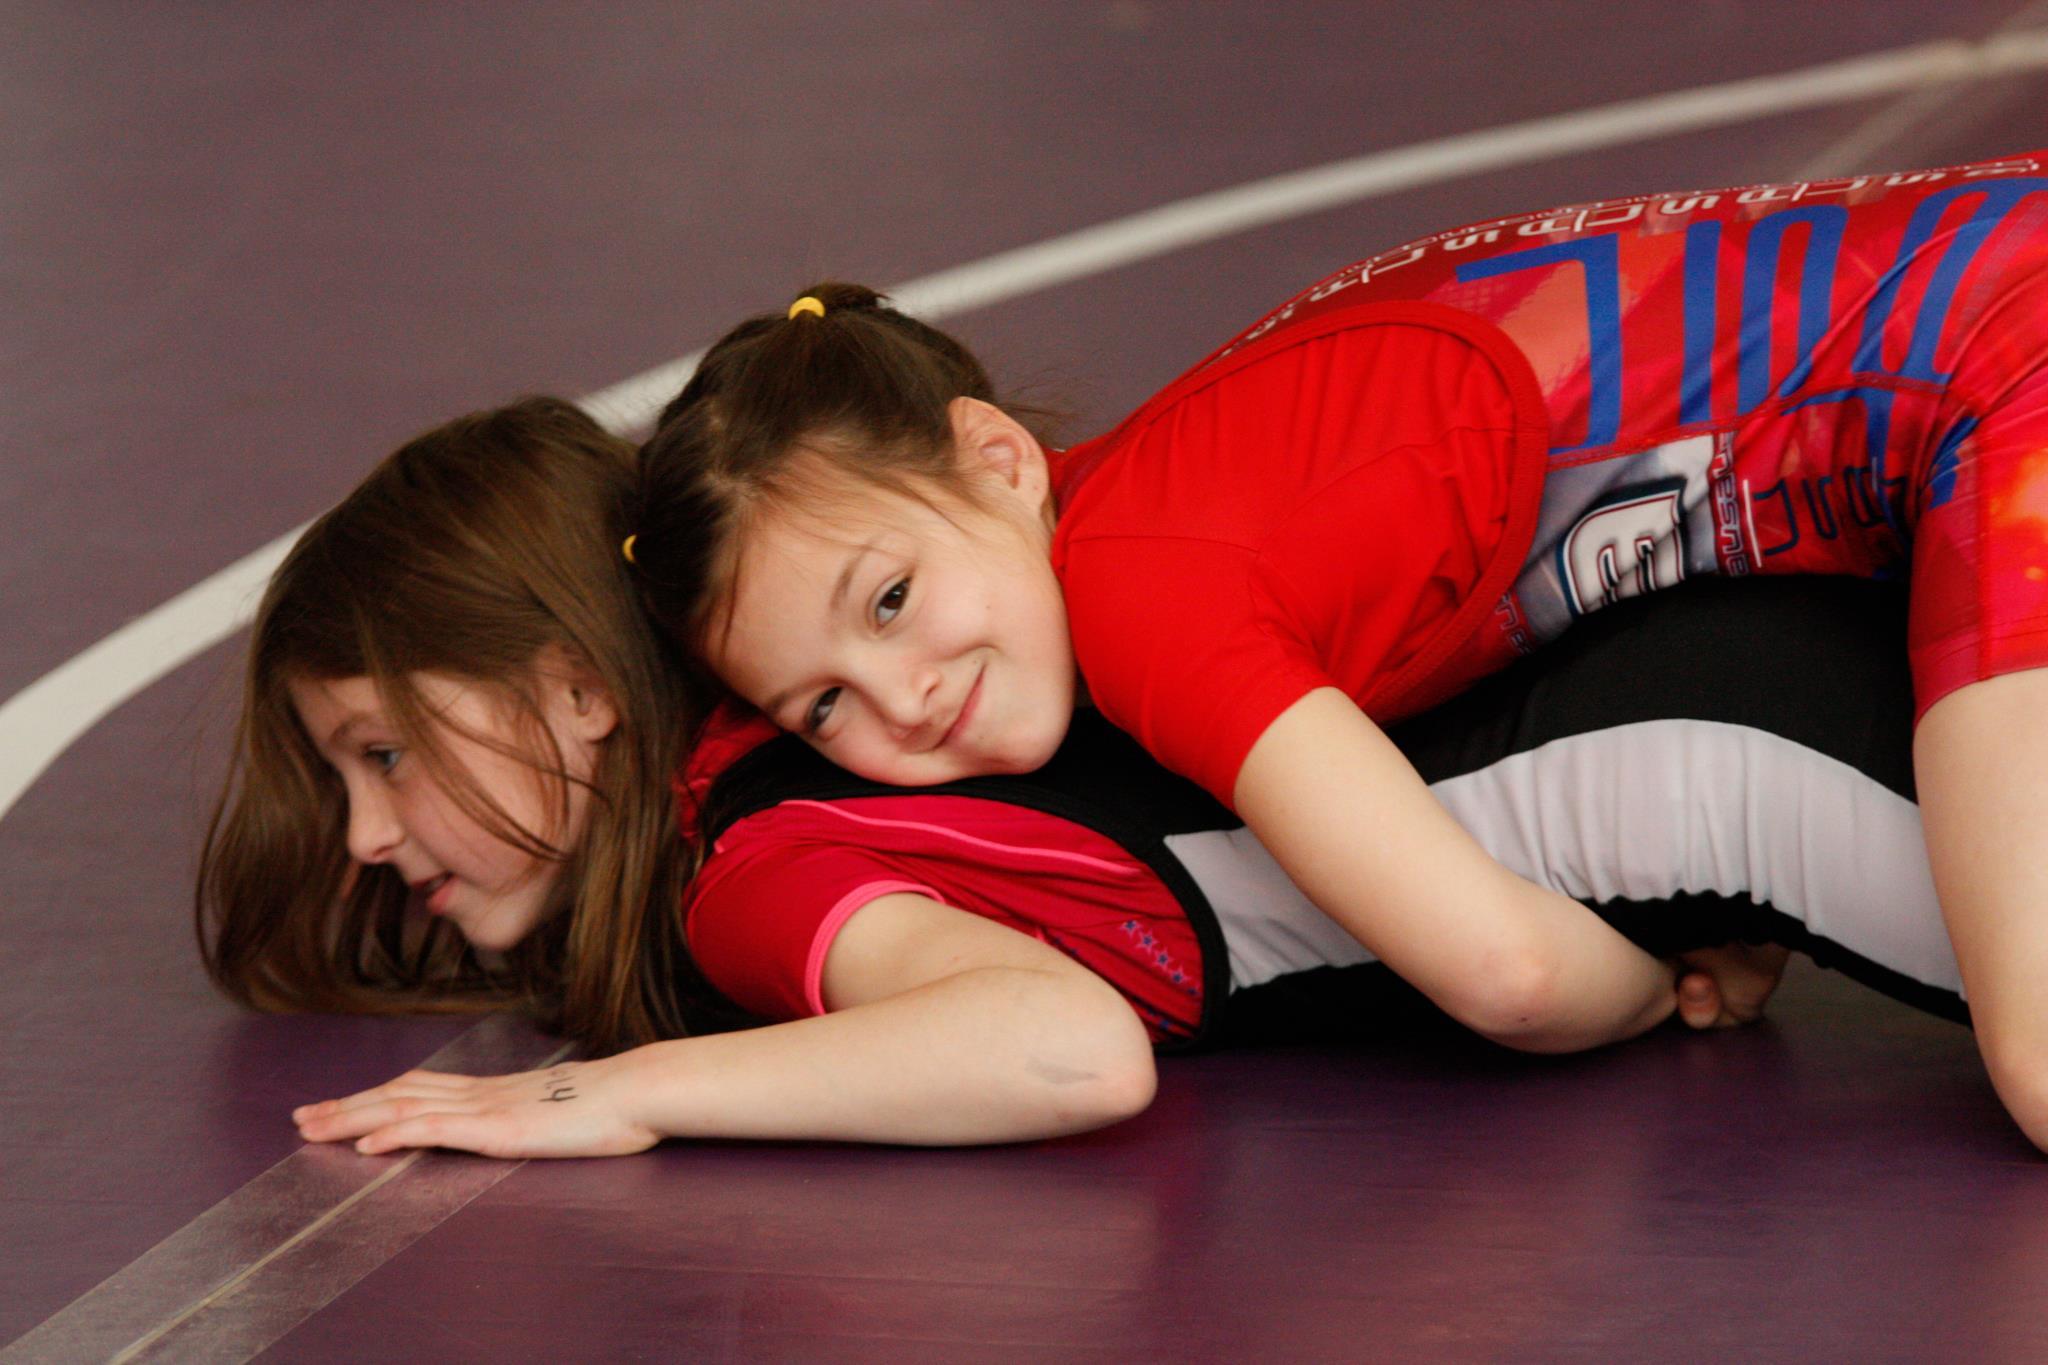 Boobs teenage girl wrestlers young horny